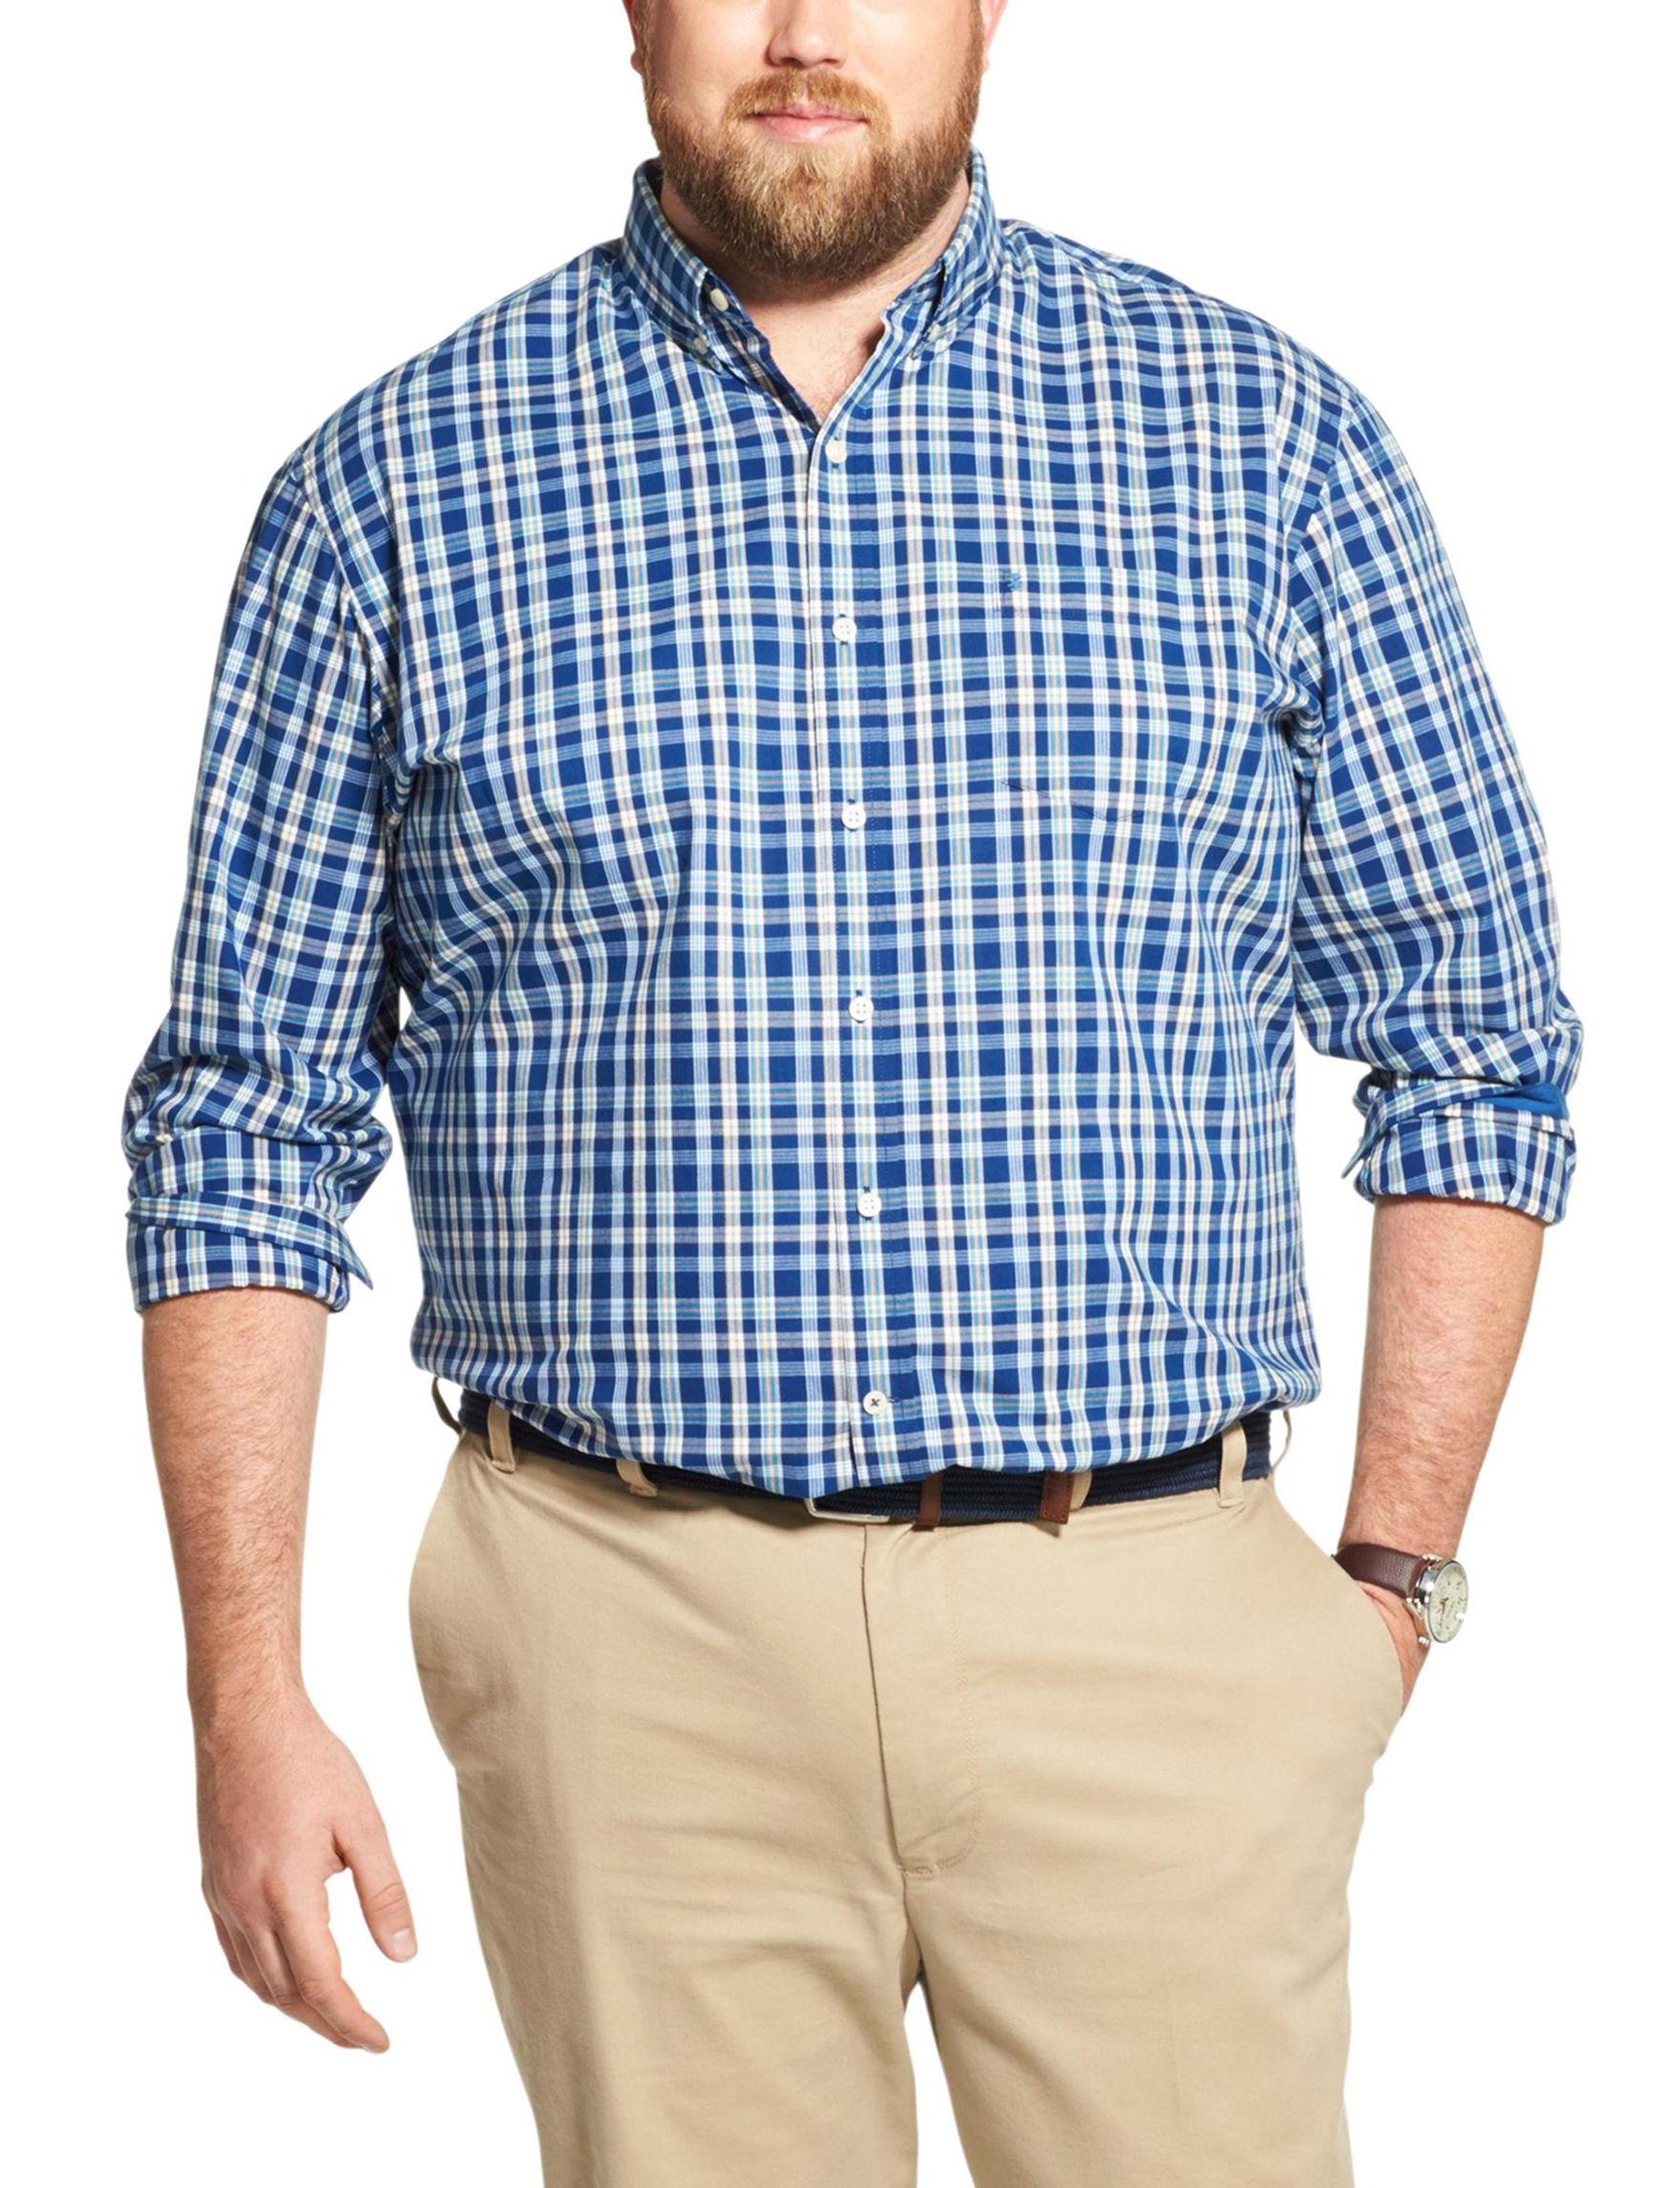 Izod Blue / White Casual Button Down Shirts